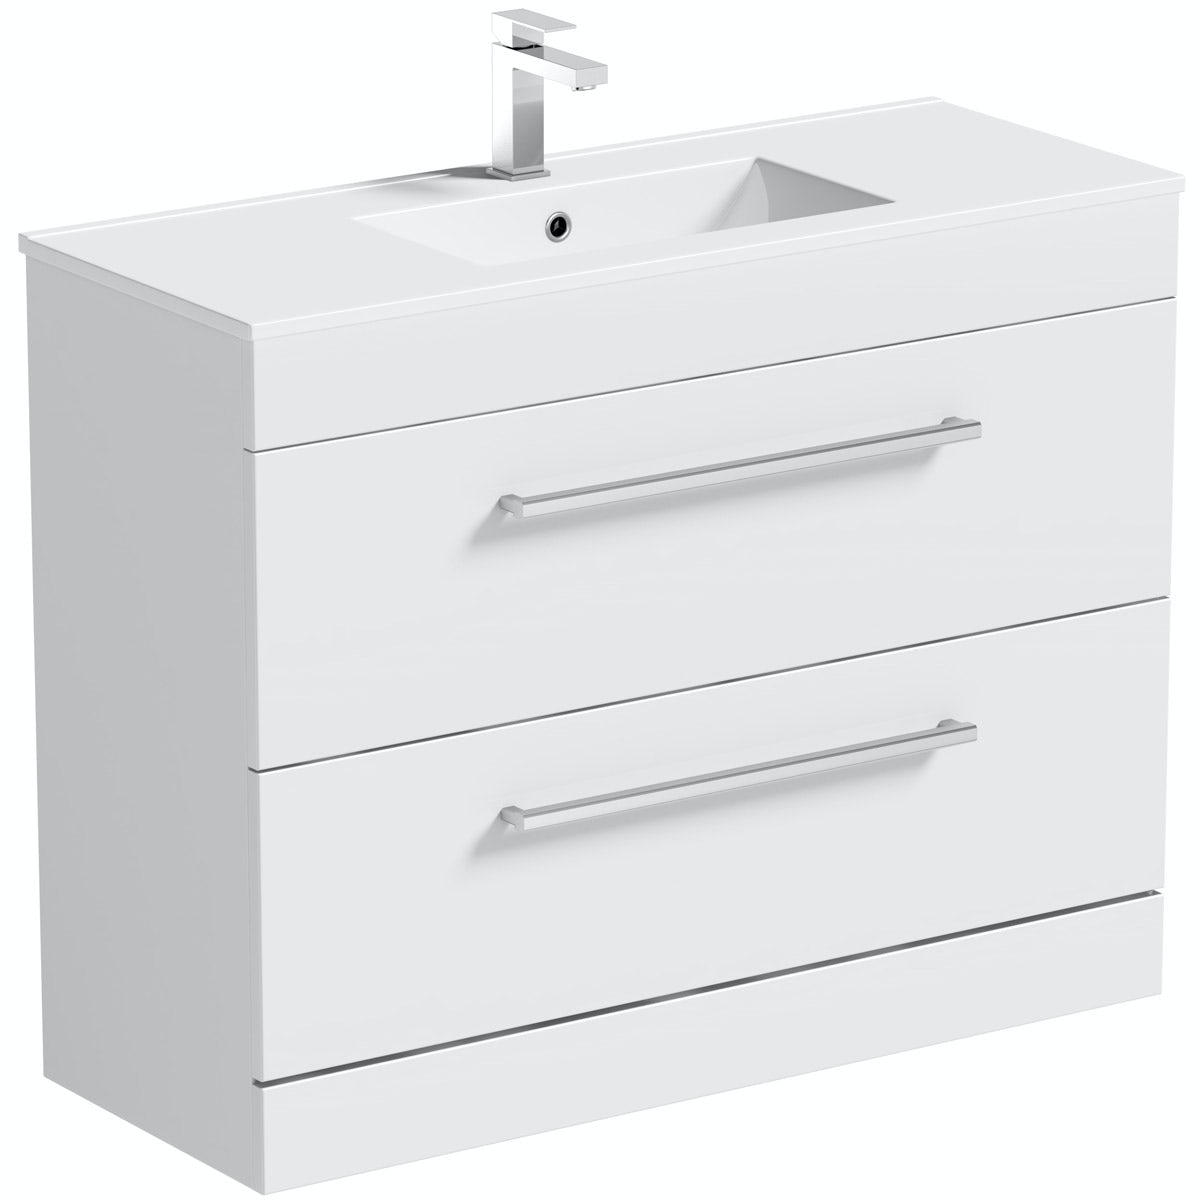 Orchard Derwent white vanity drawer unit and basin 900mm